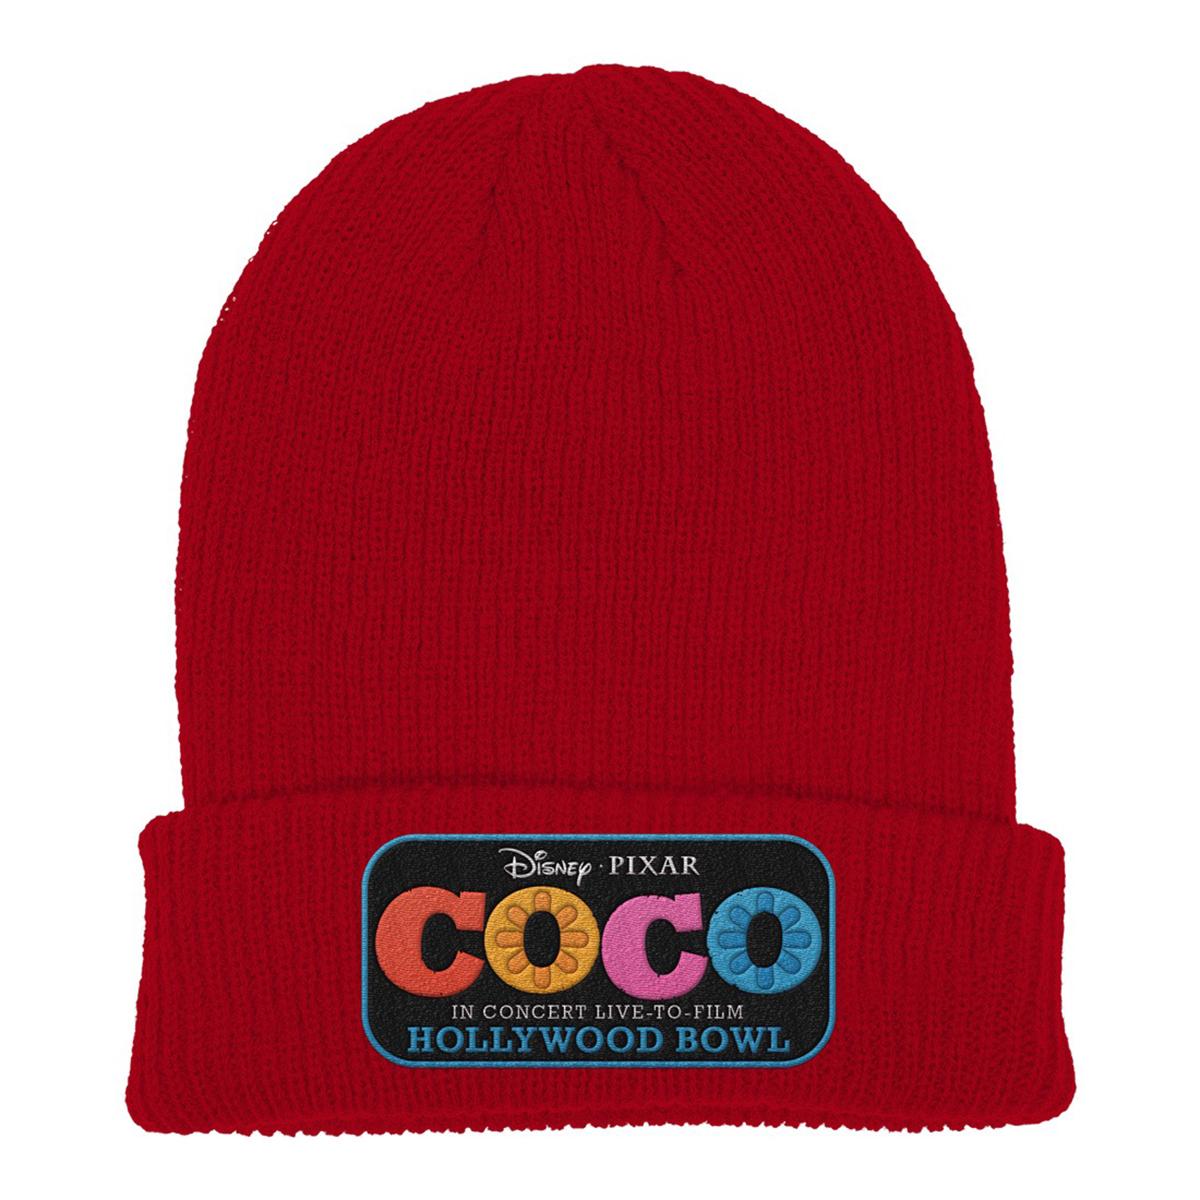 Coco Hollywood Bowl Beanie